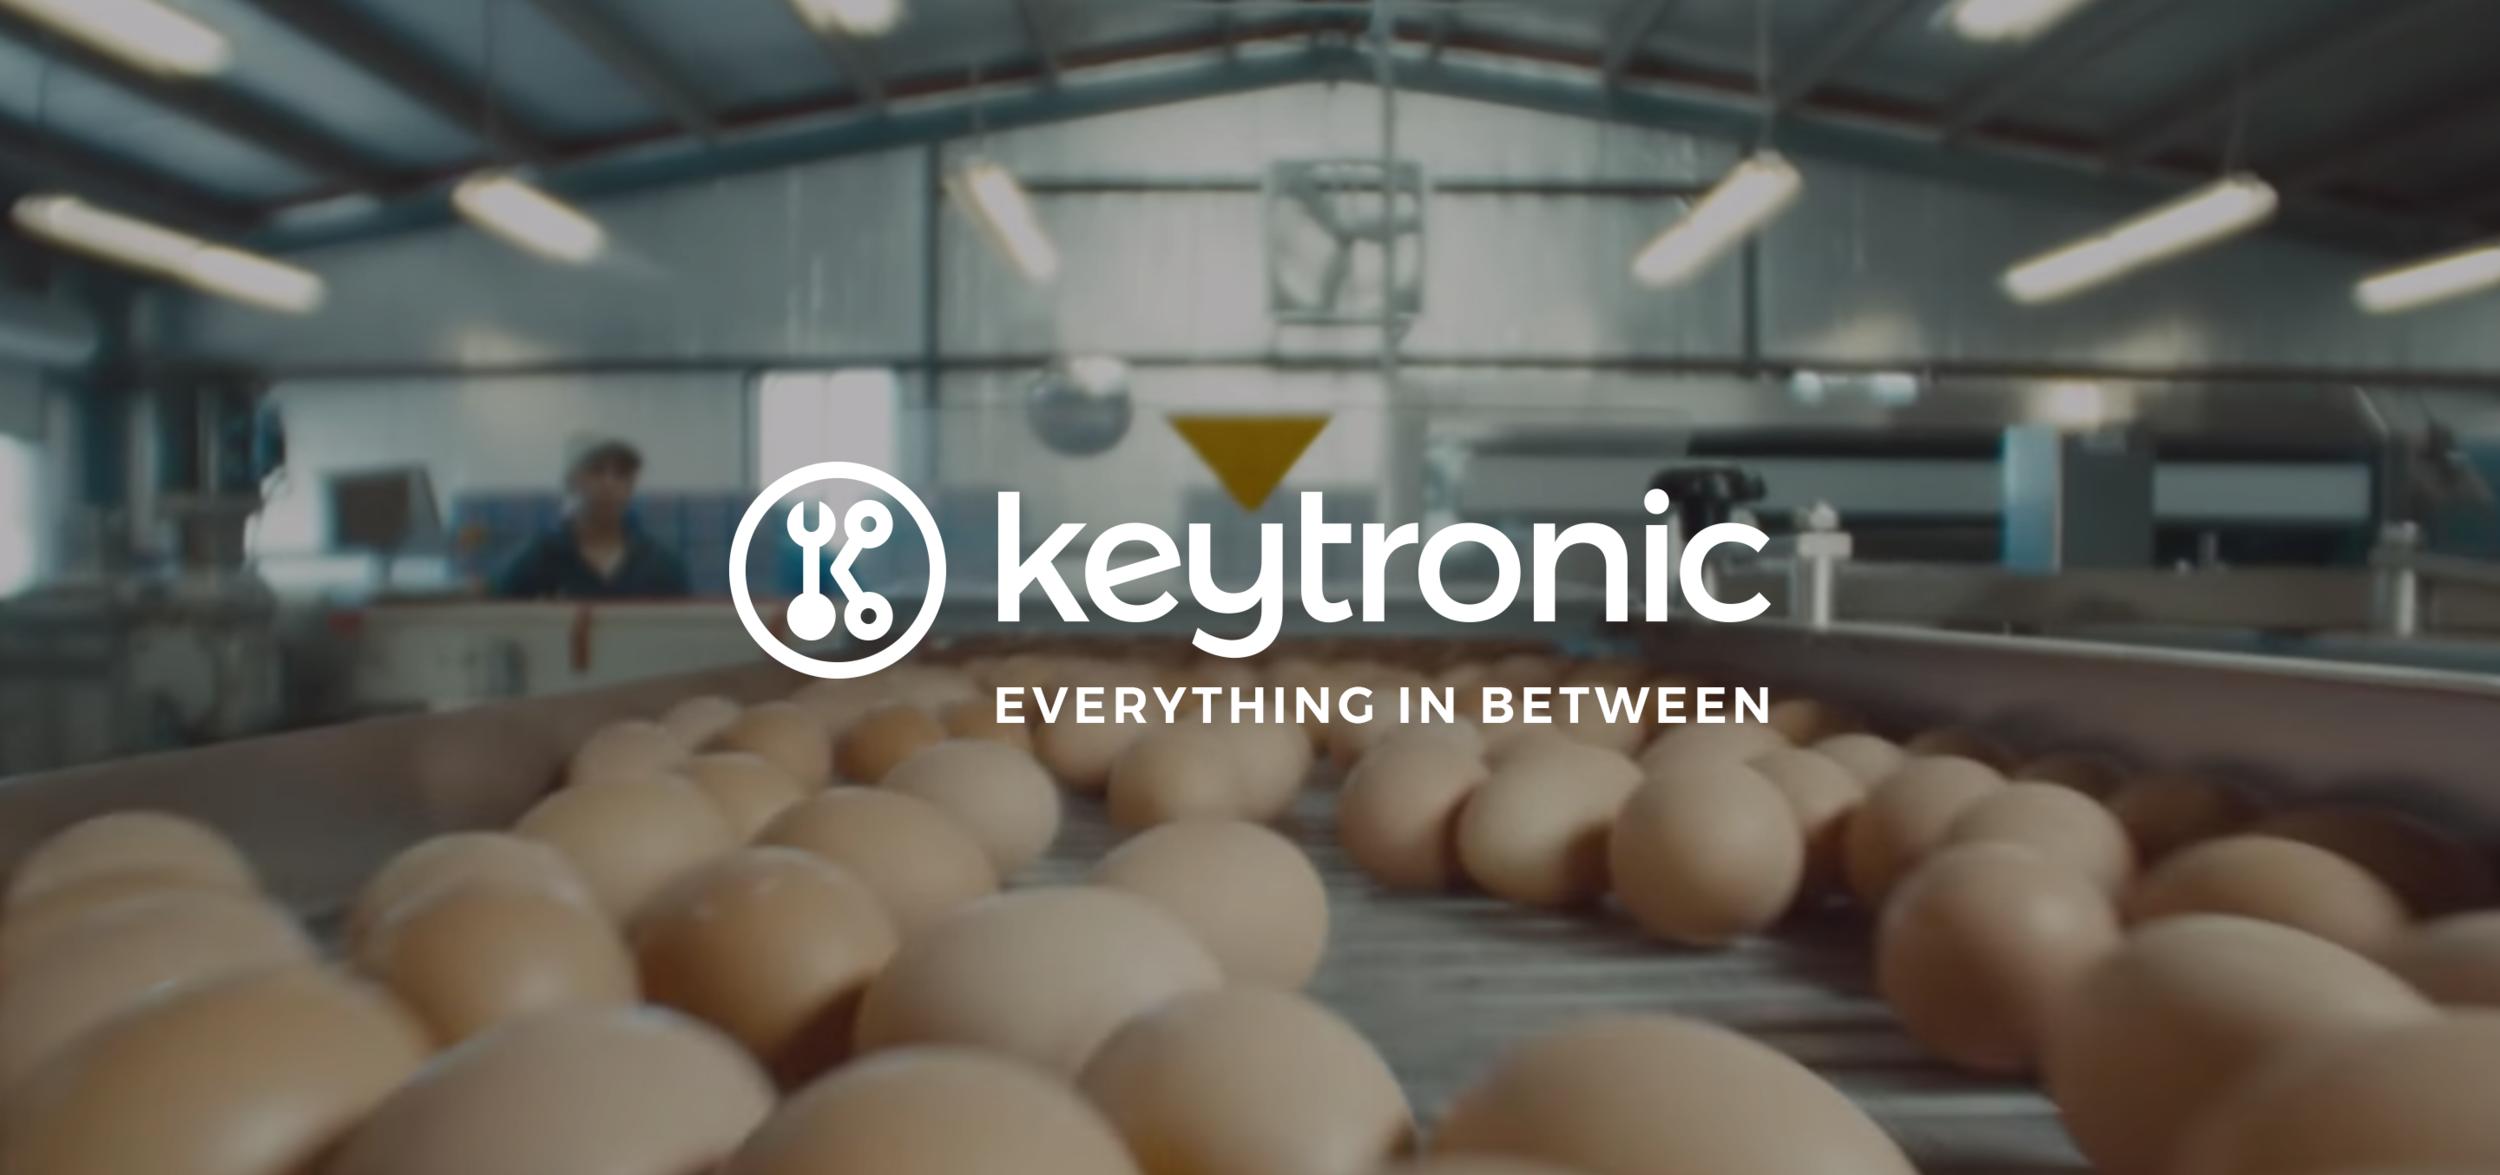 Keytronic_EverythingInBetween1.png